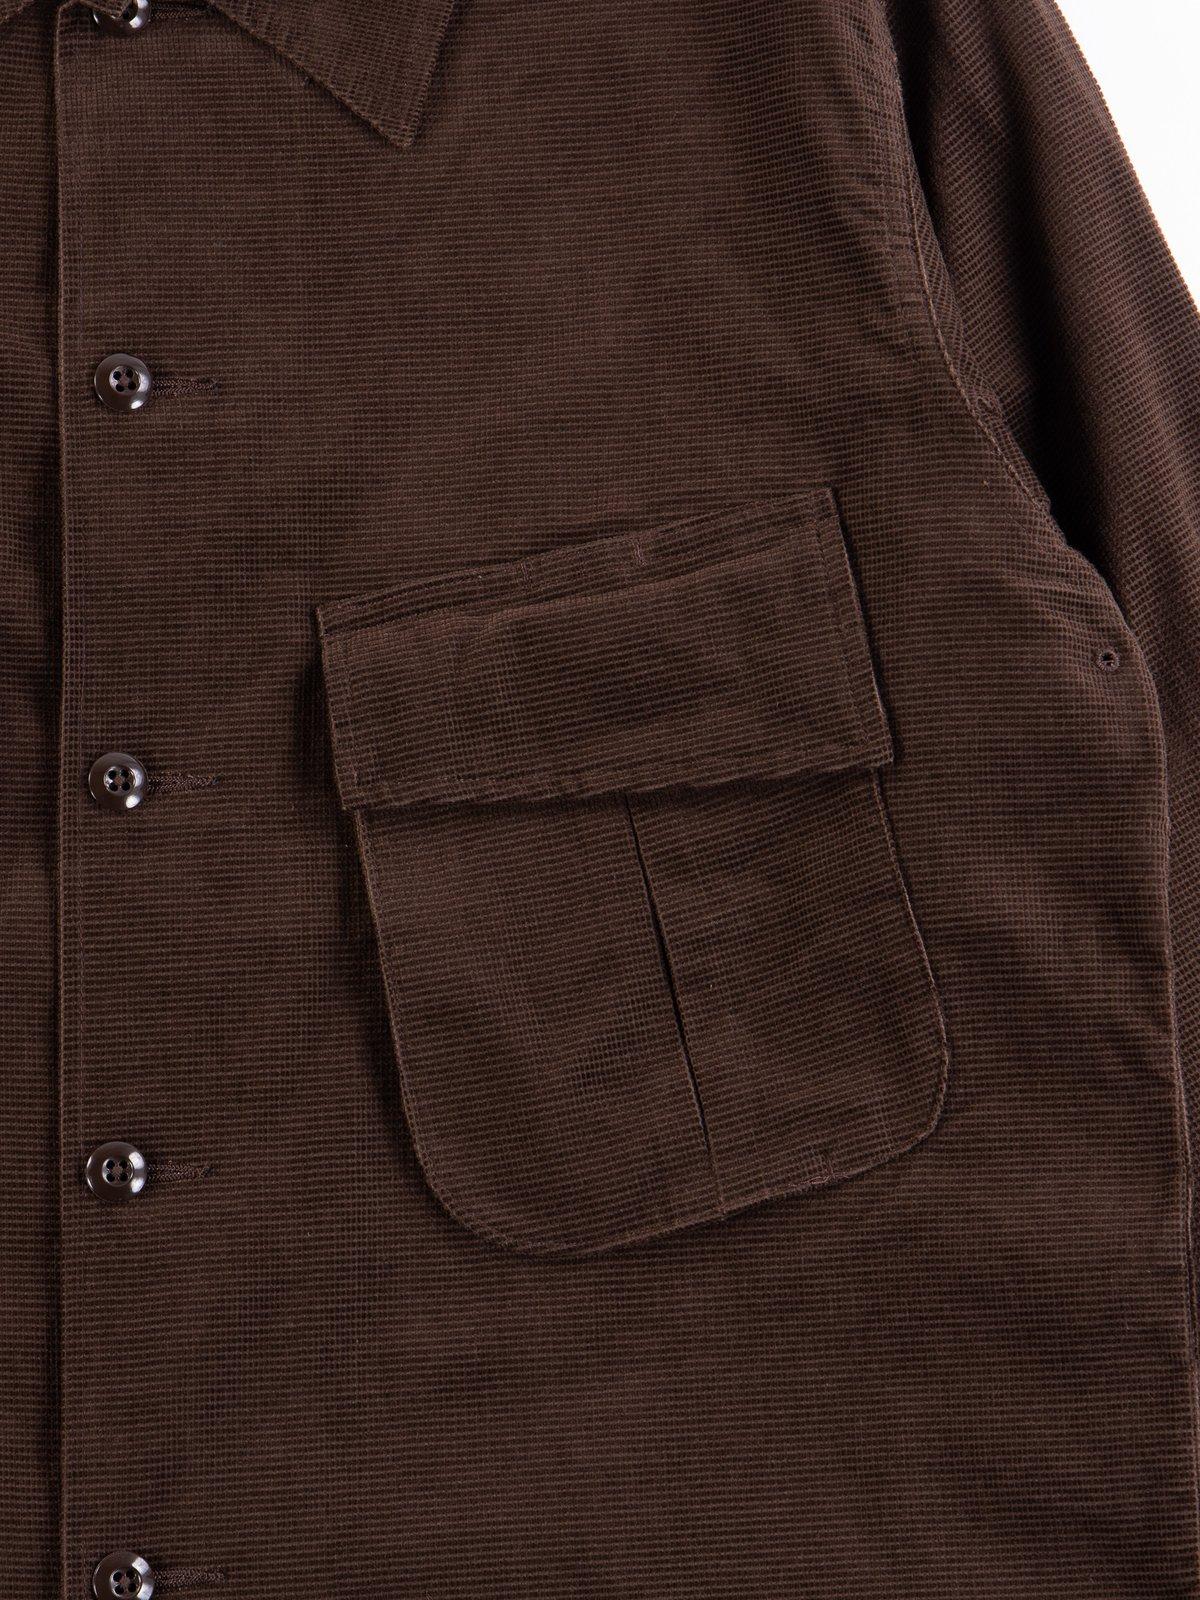 Dark Brown Dobby Caramel Corduroy Combat Short Jacket - Image 4